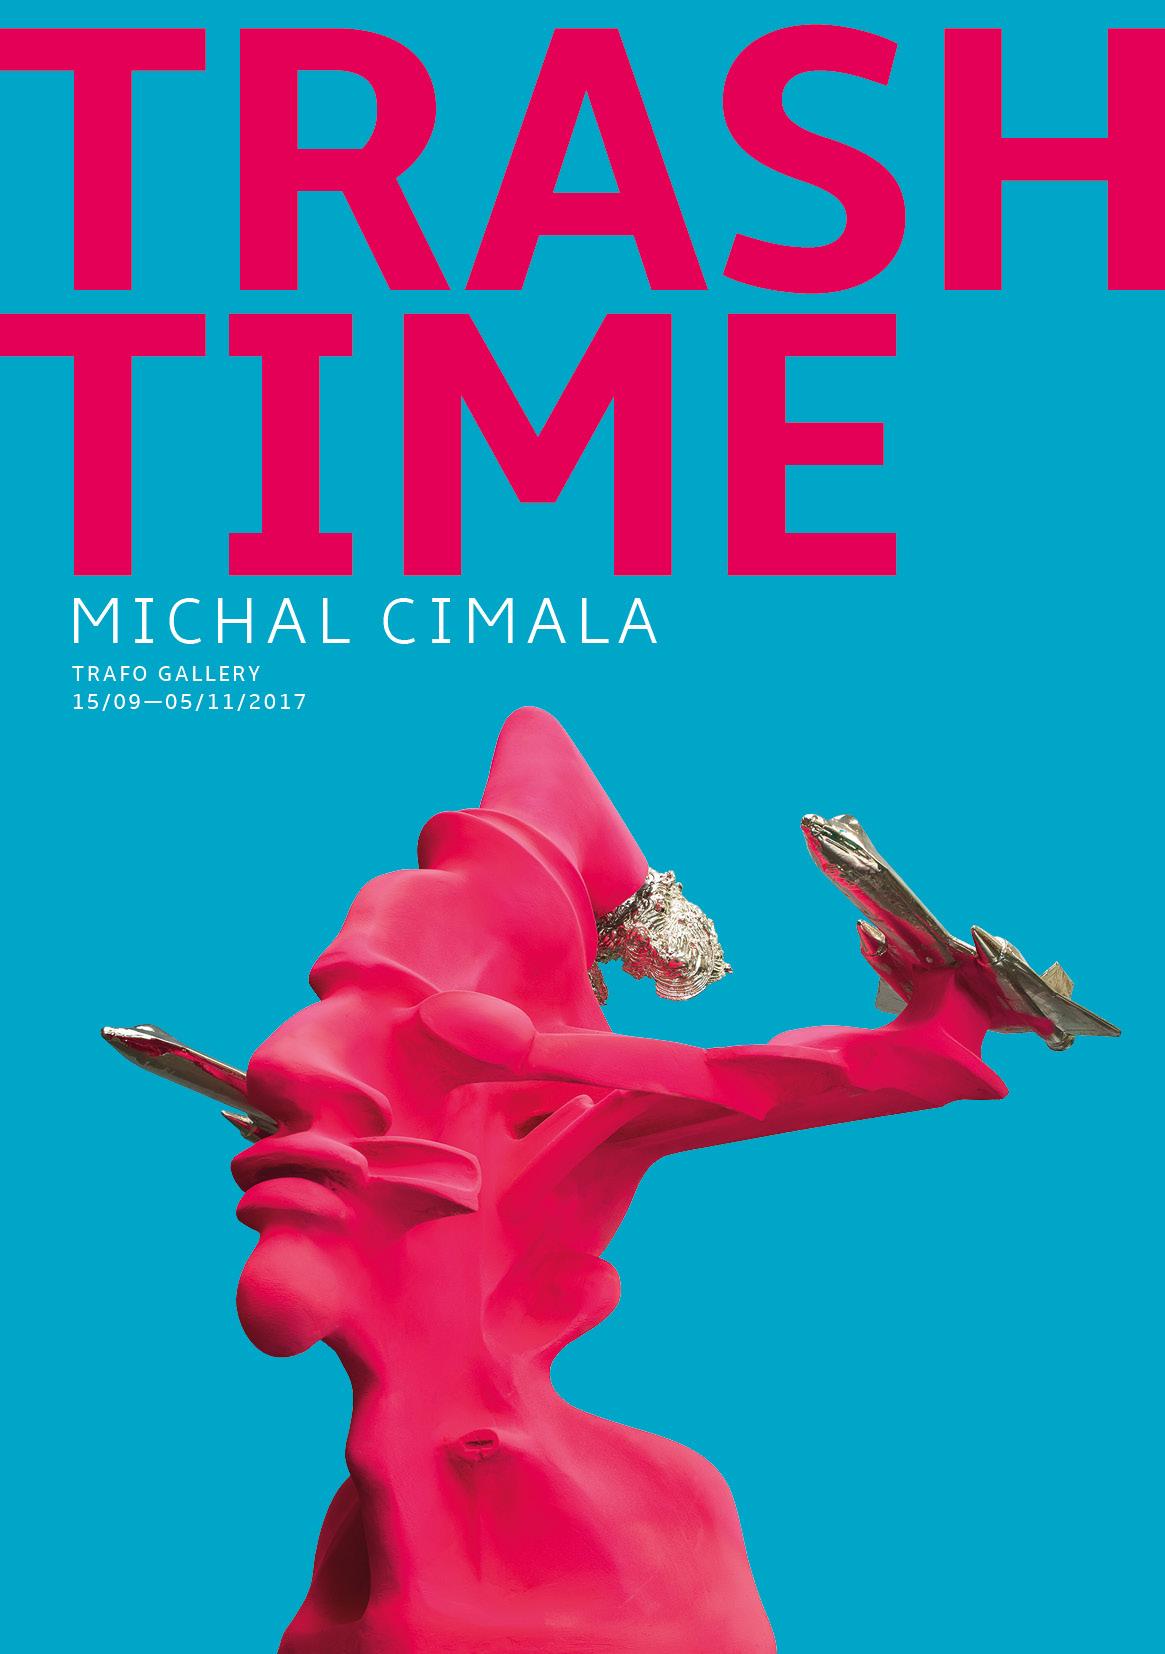 MICHAL CIMALA: TRASH TIME (DON'T RUN!)